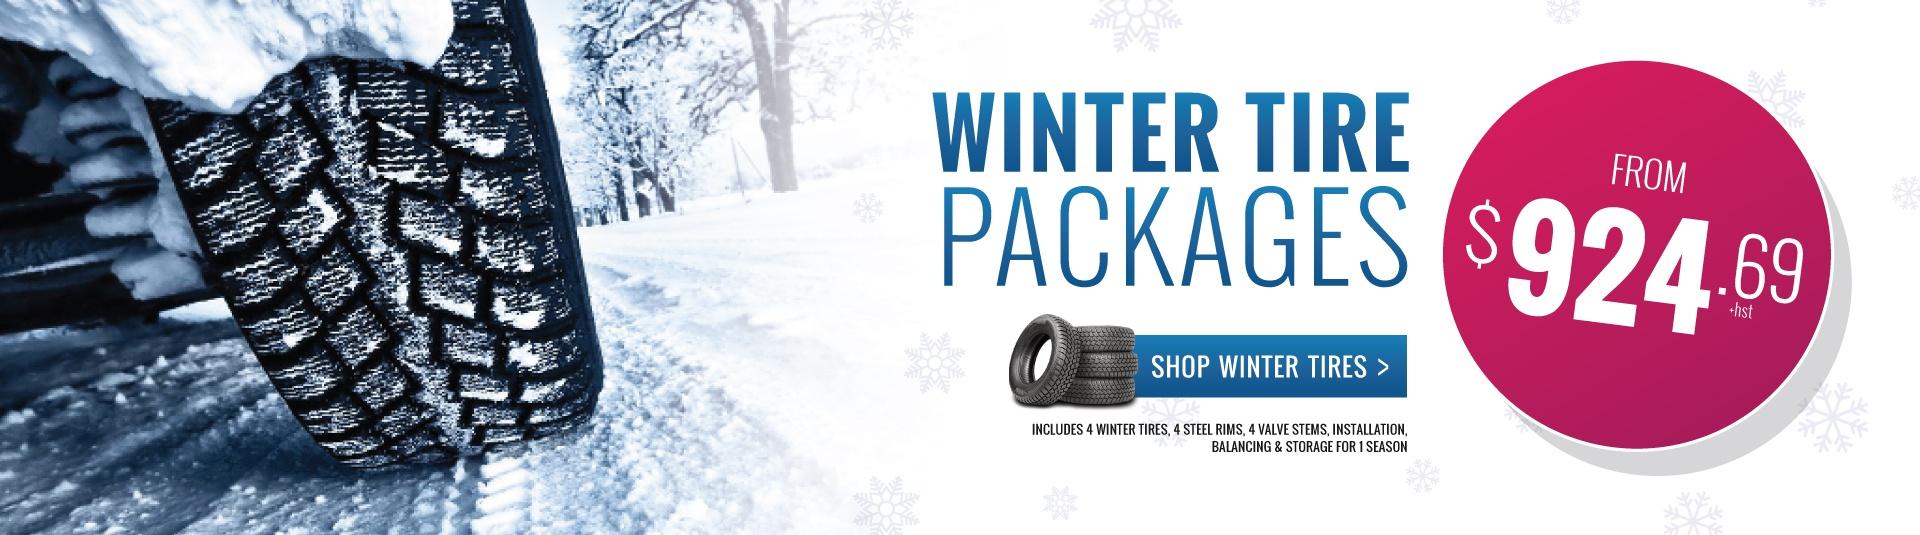 CD-Winter-Tires-Packages-Slidefr-1920x535-Oct2018